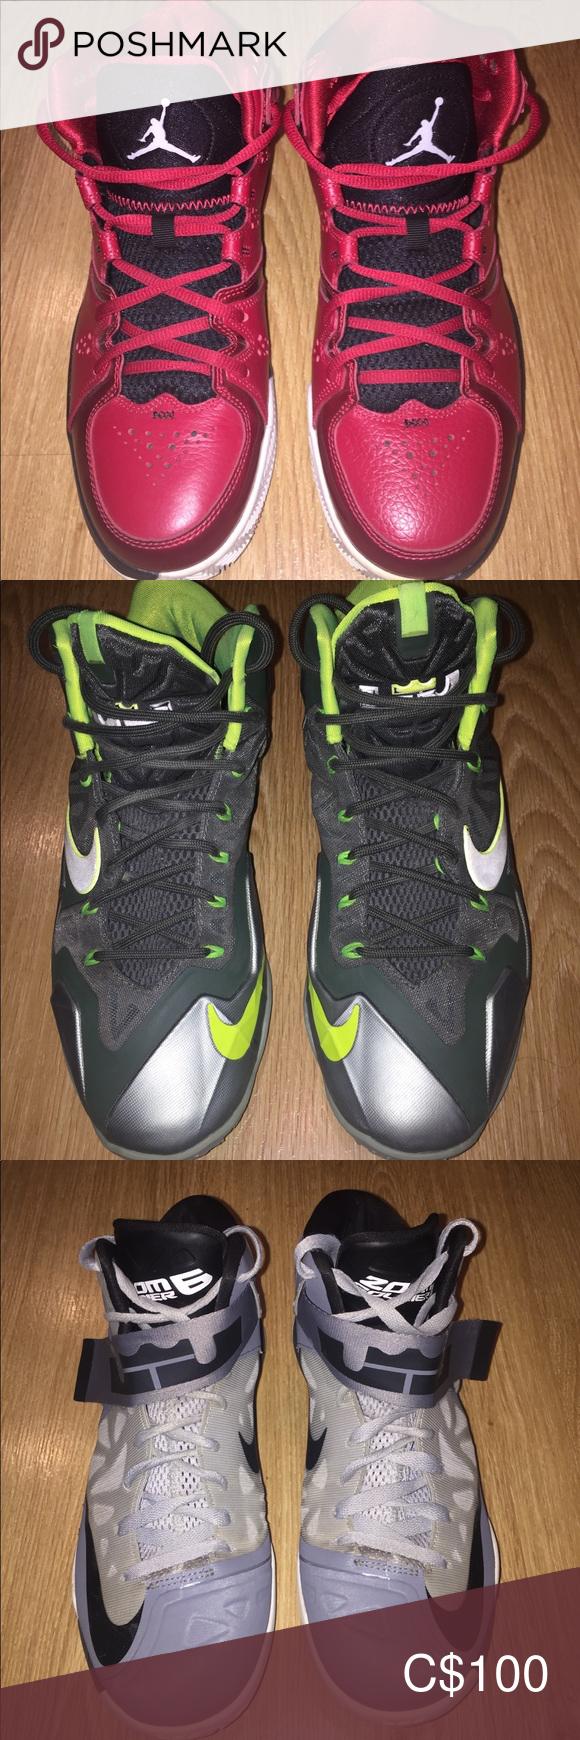 Jordan's \u0026 Lebron basketball shoes Red